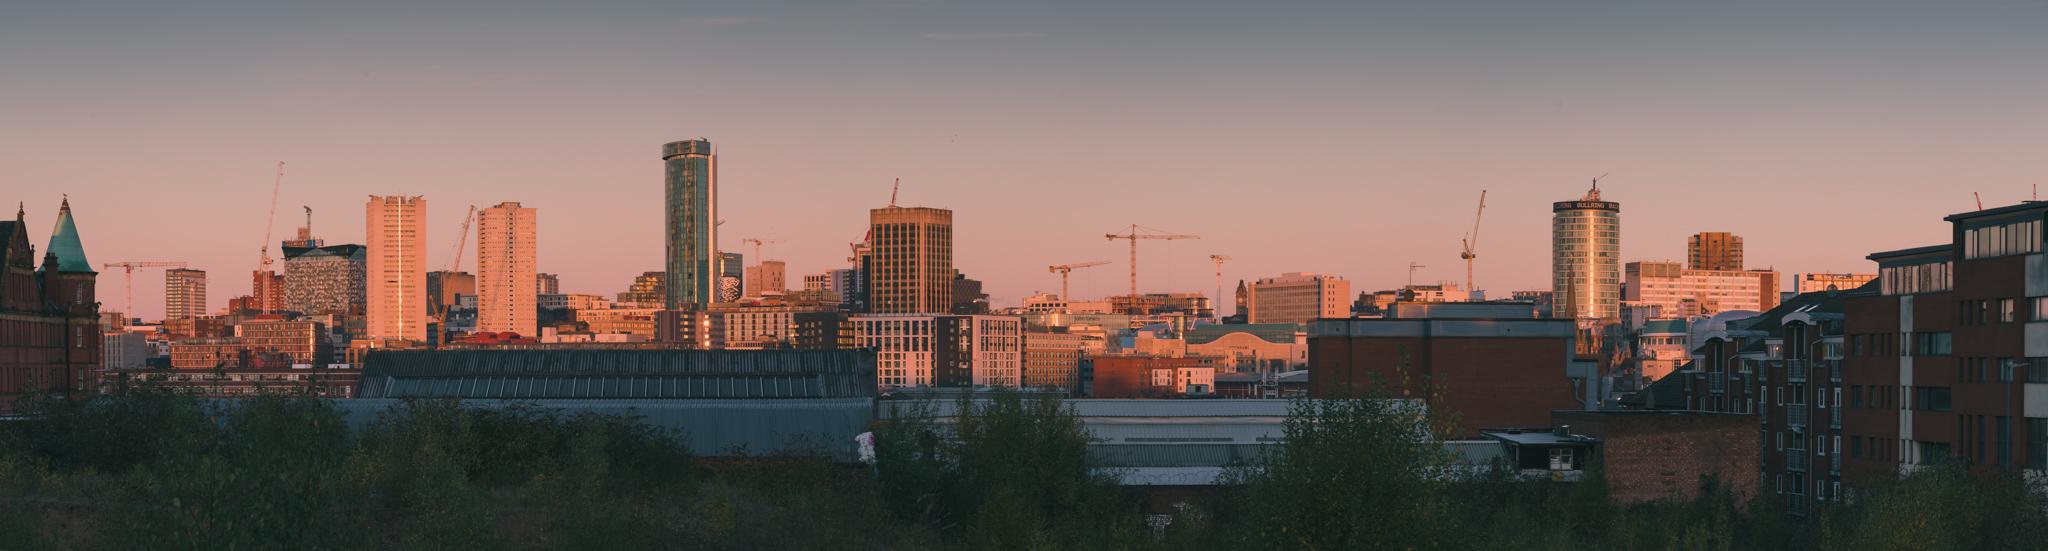 Birmingham's iconic skyline captured from Moseley Street